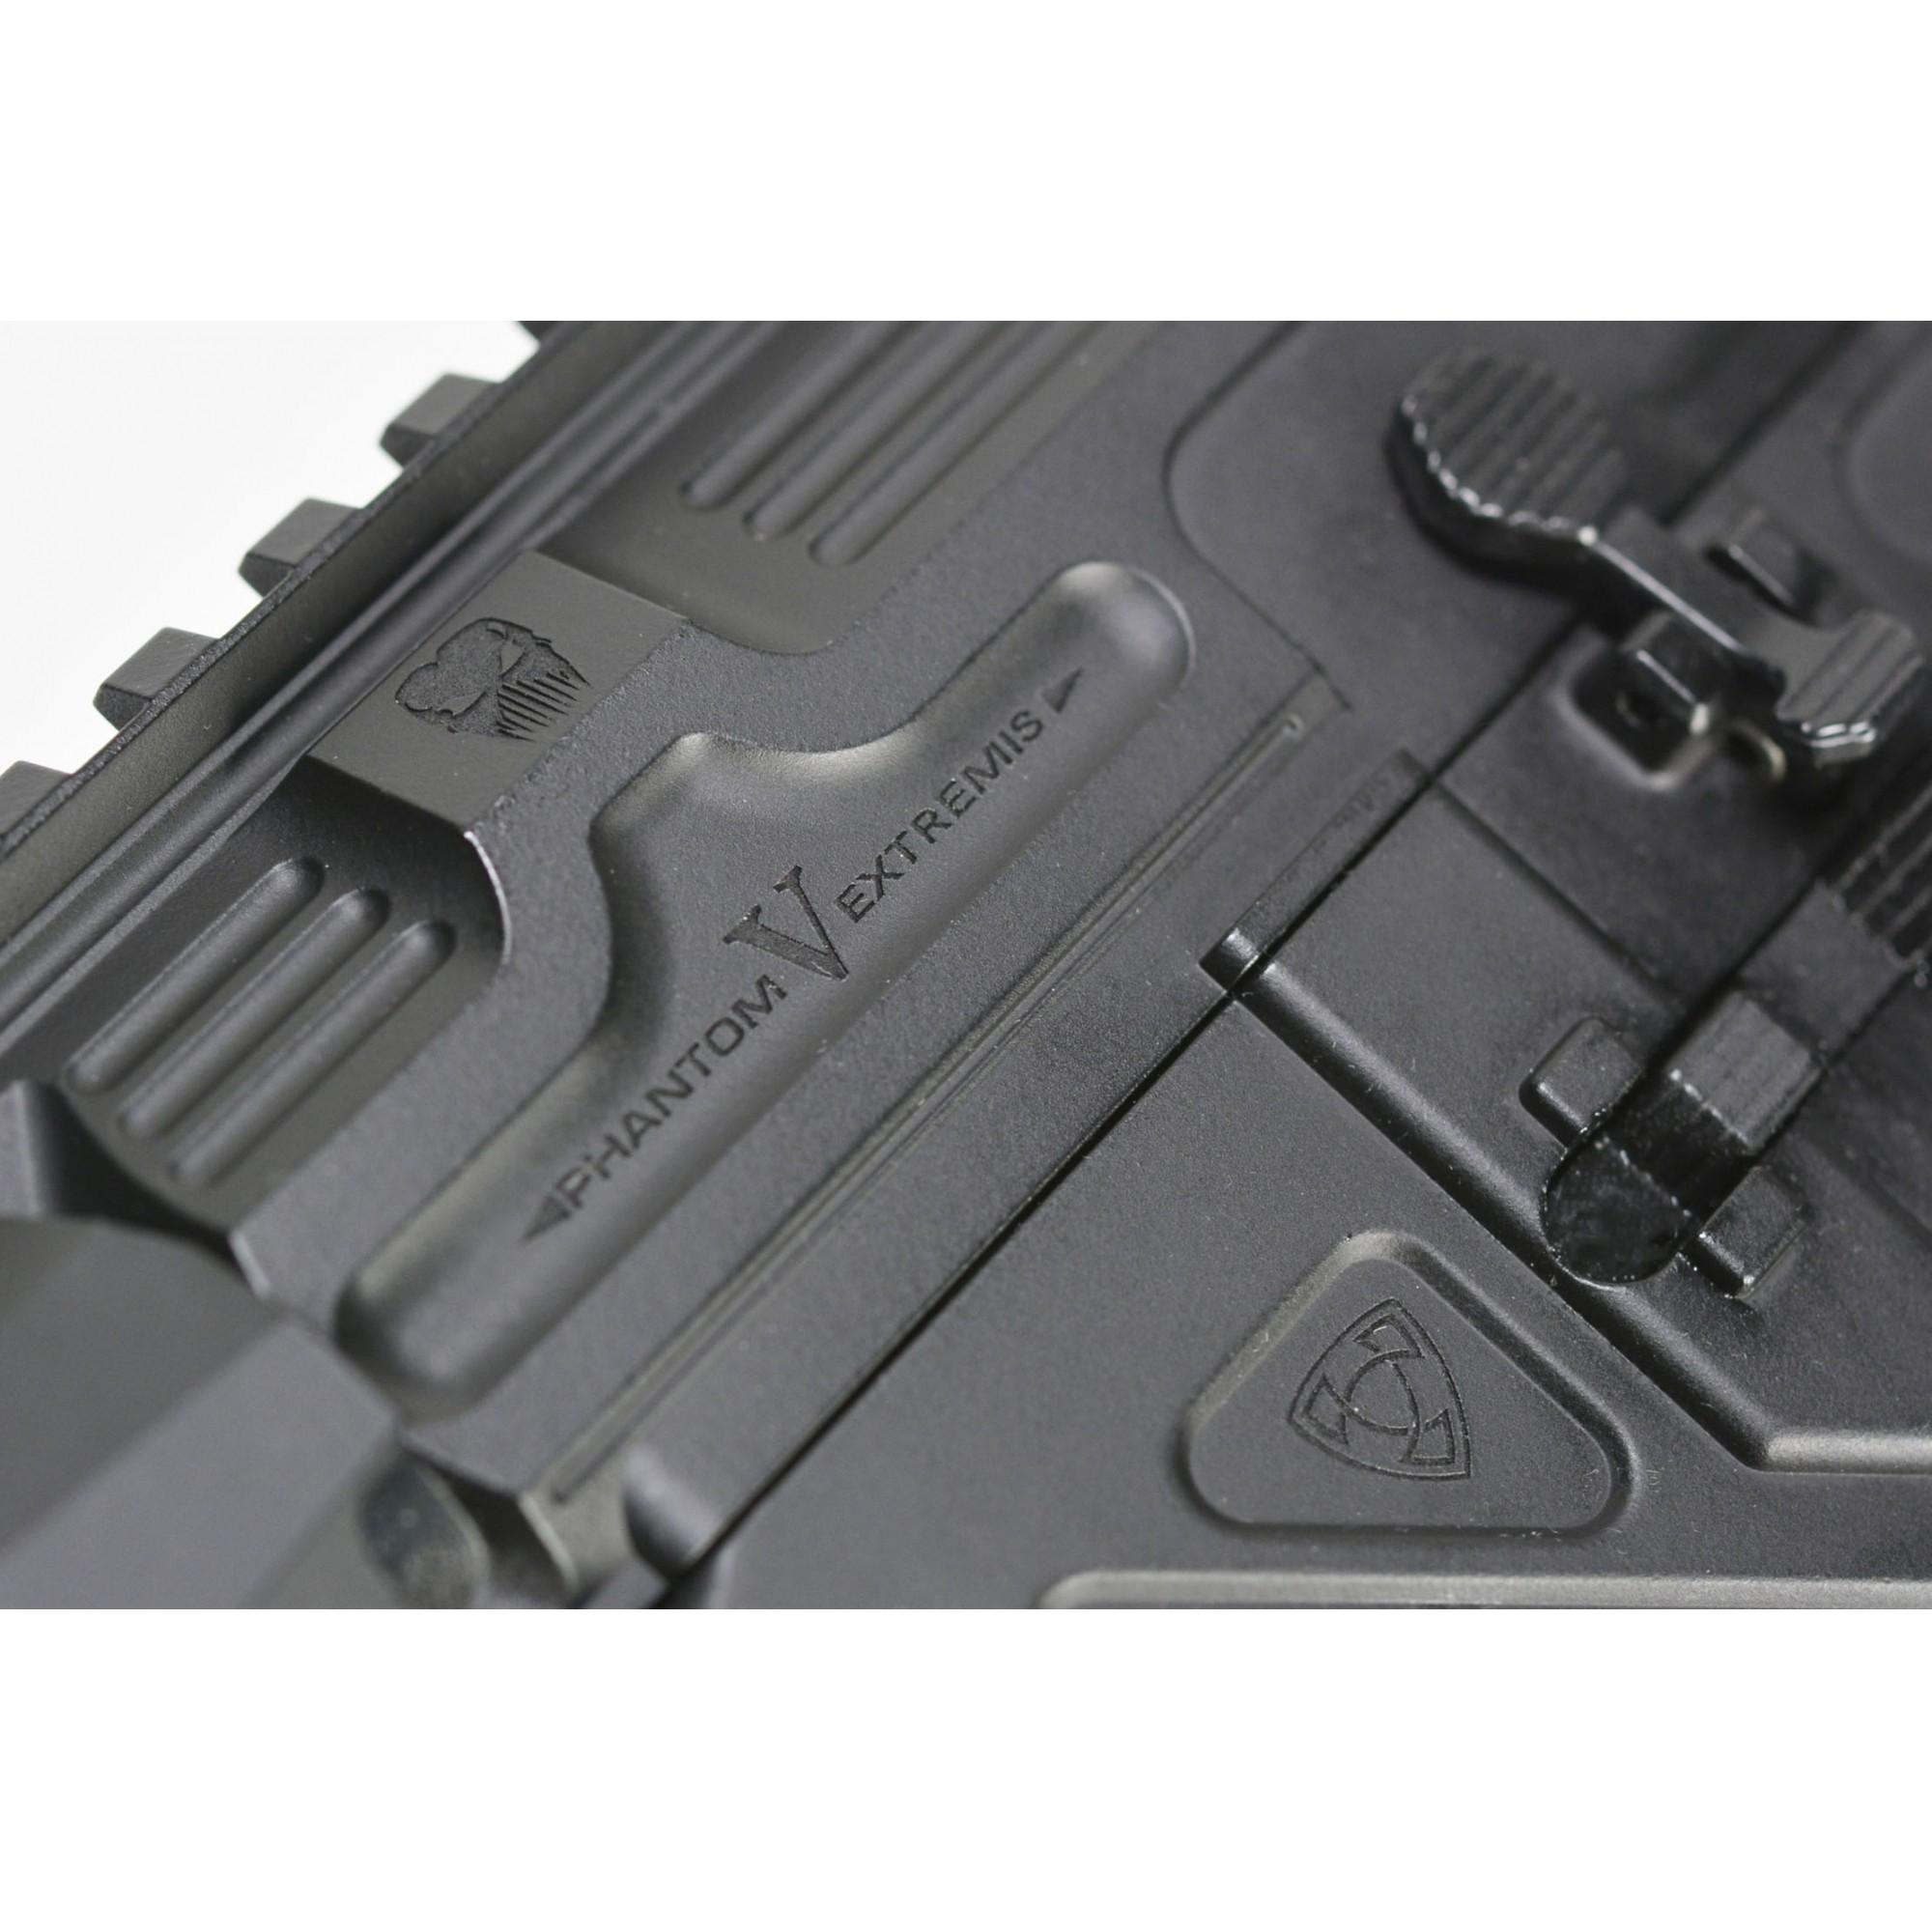 RIFLE DE AIRSOFT AEG M4 PHANTOM EXTREMIS RIFLES MKV 10 FULL METAL BLOWBACK PER705 - APS